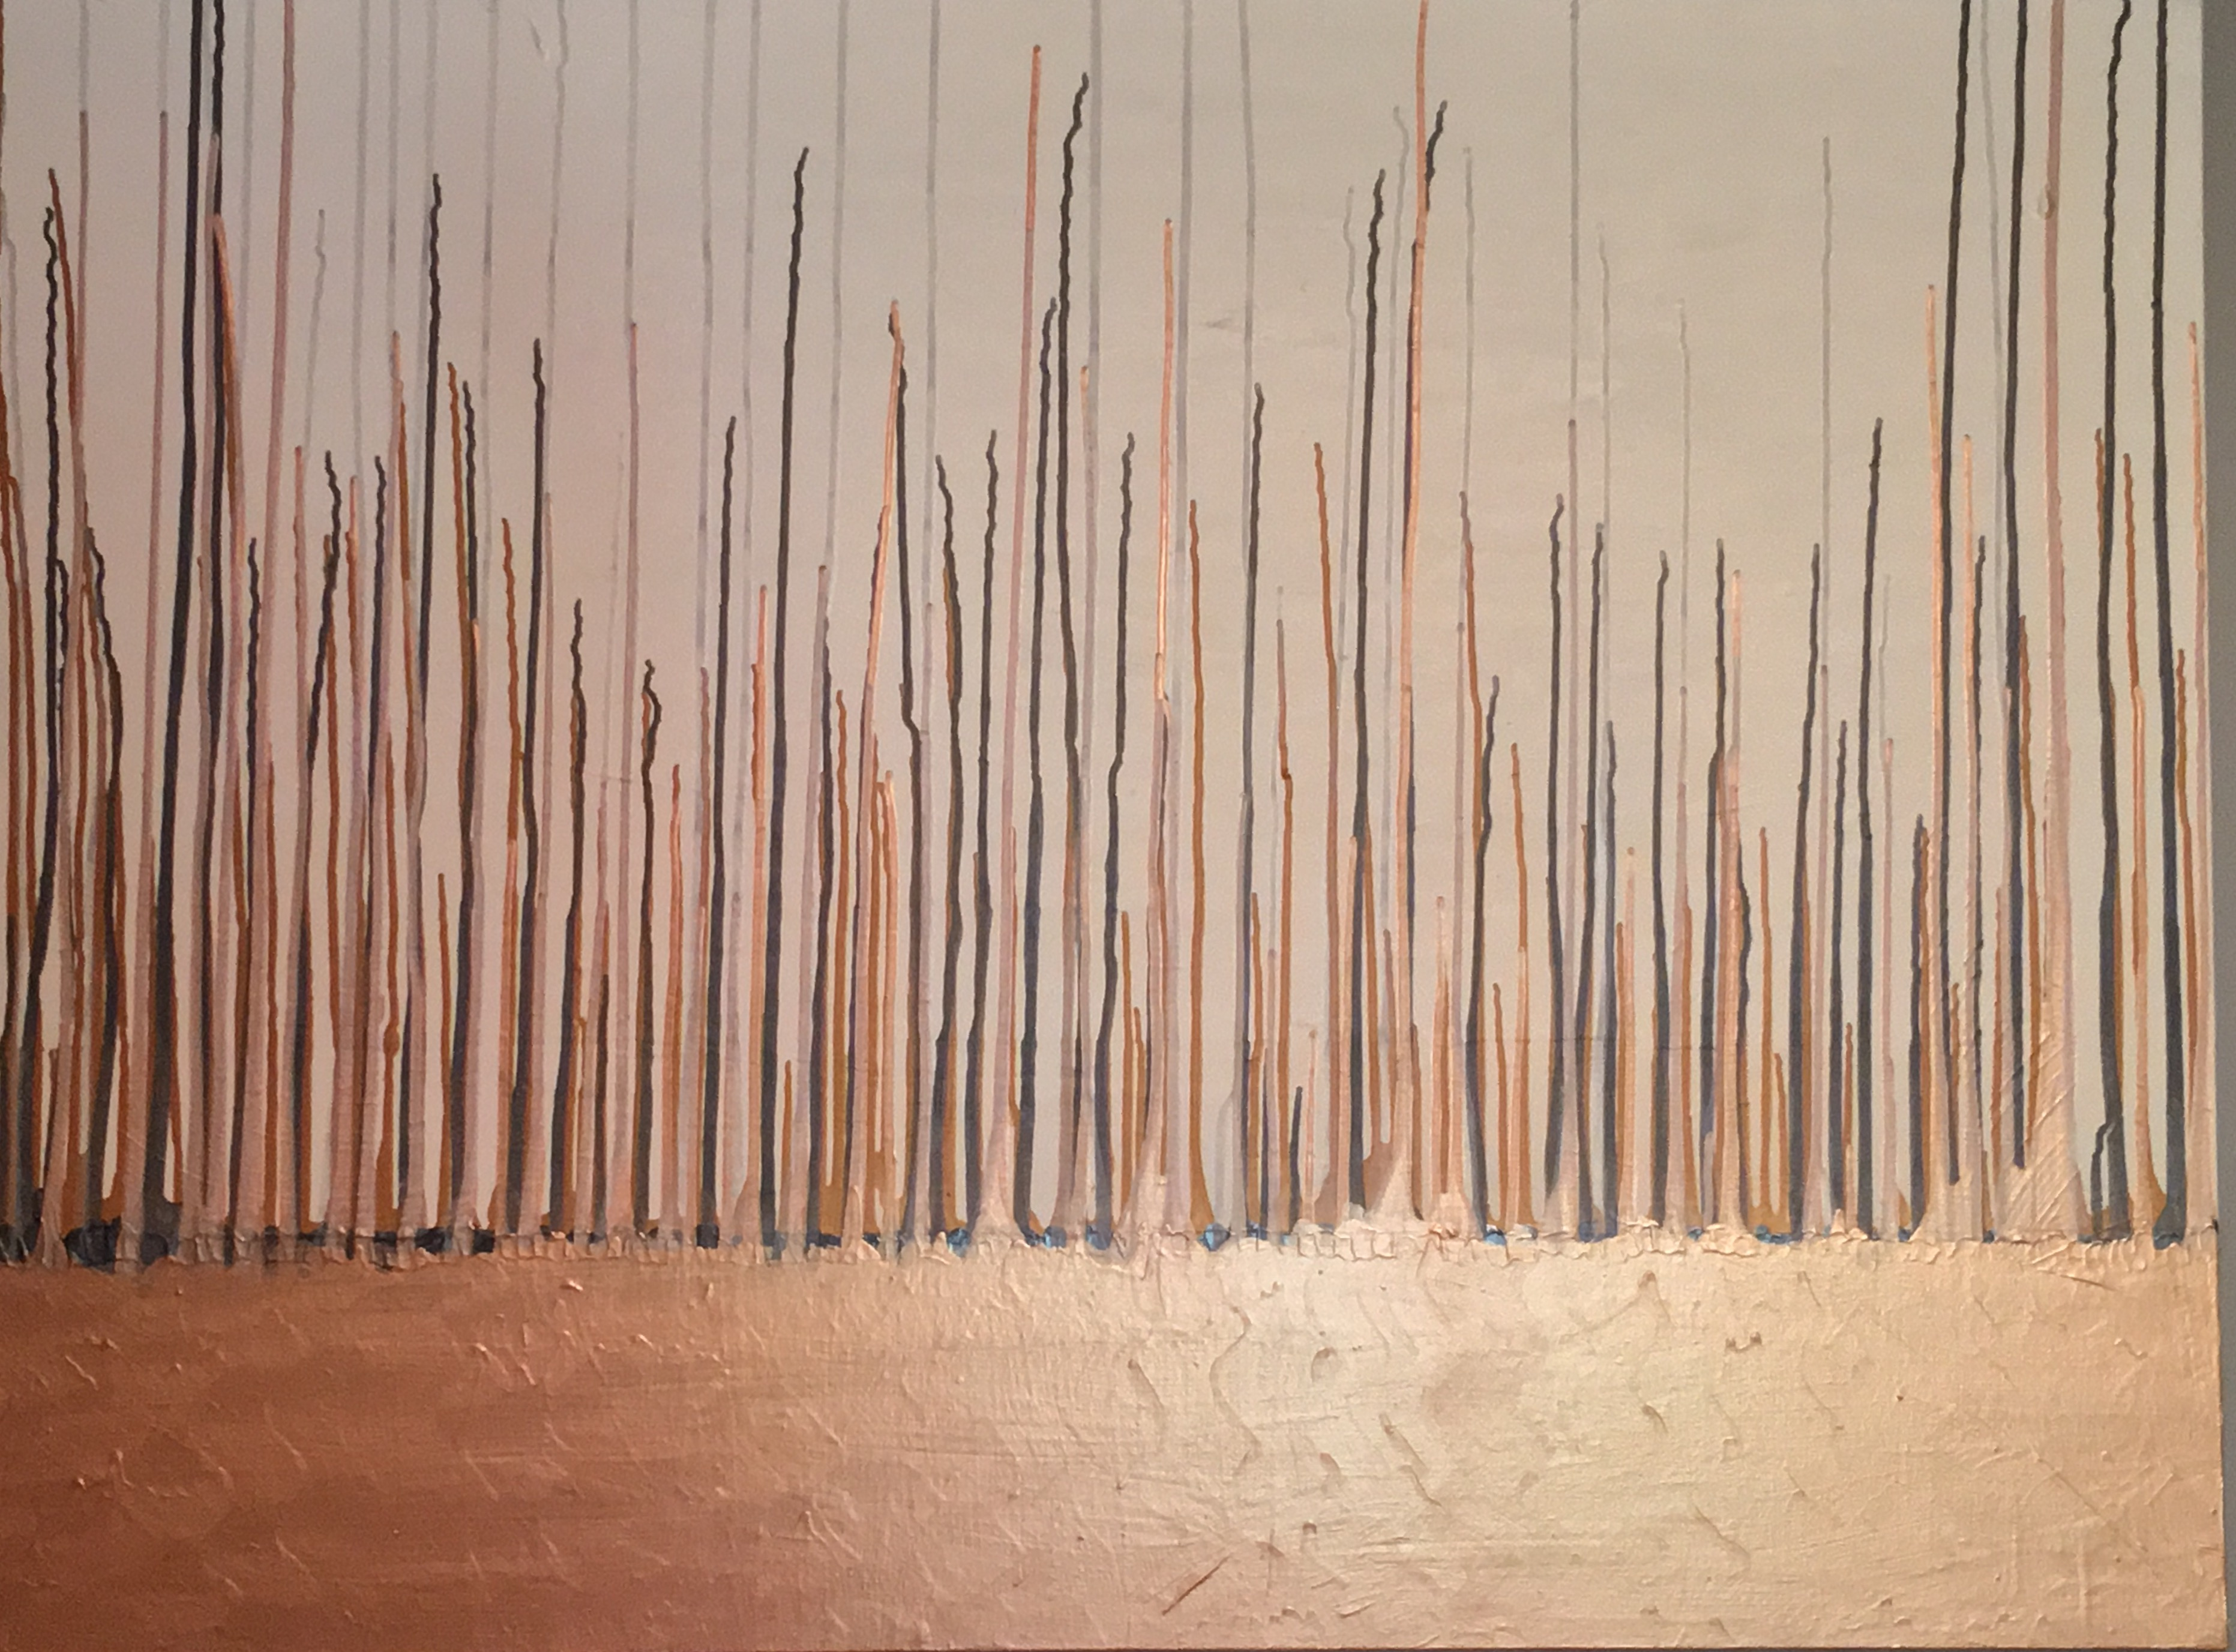 Indigenous Rising by Toni Poe